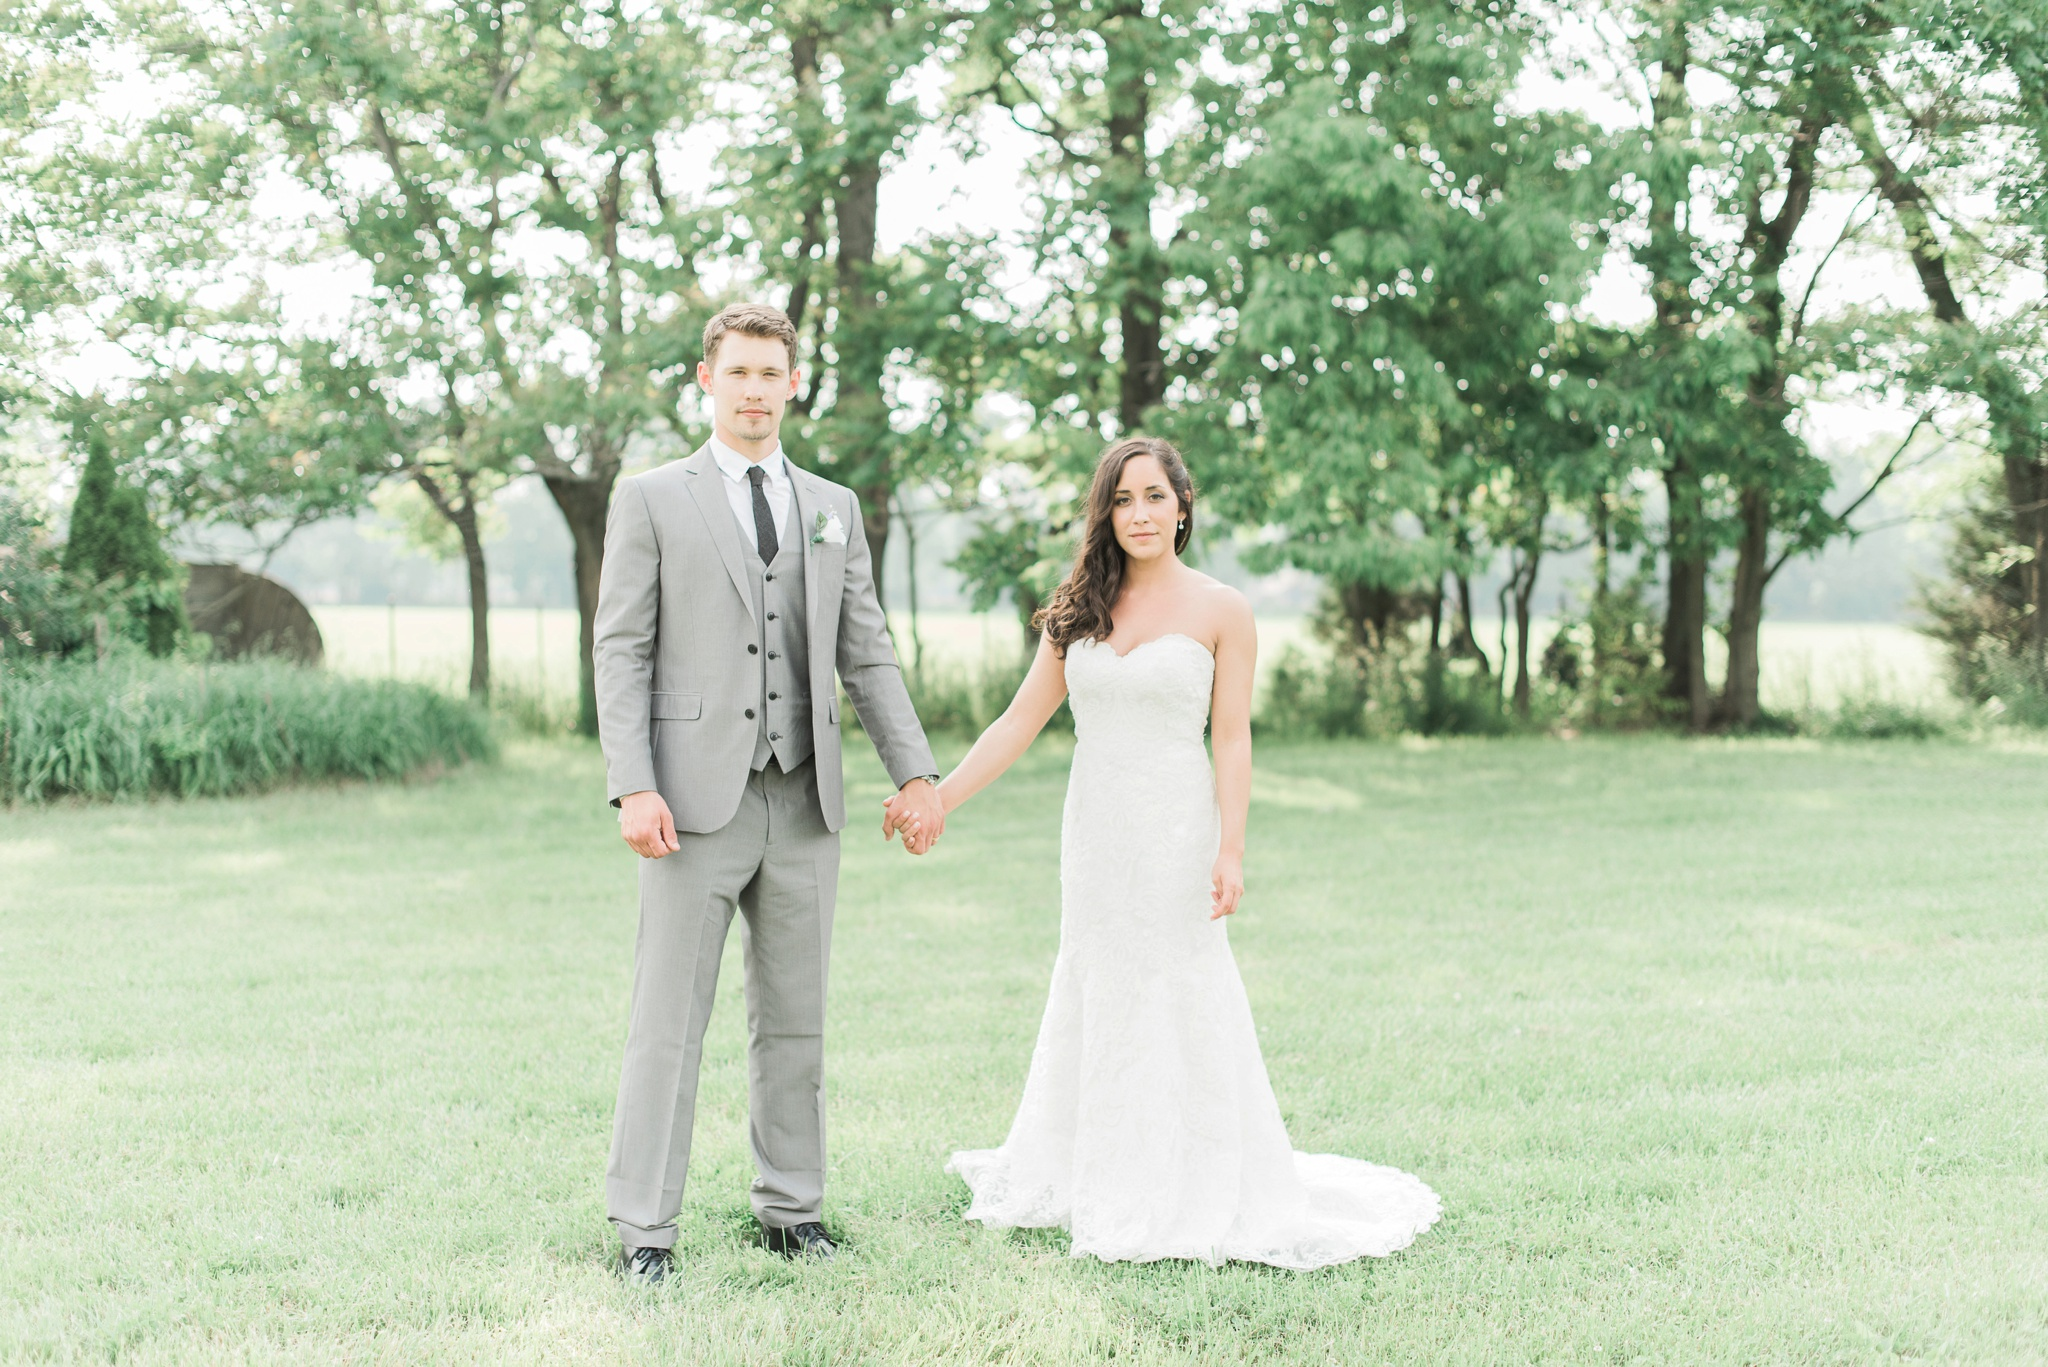 niederman-farm-wedding-cincinnati-ohio-photographer_0080.jpg